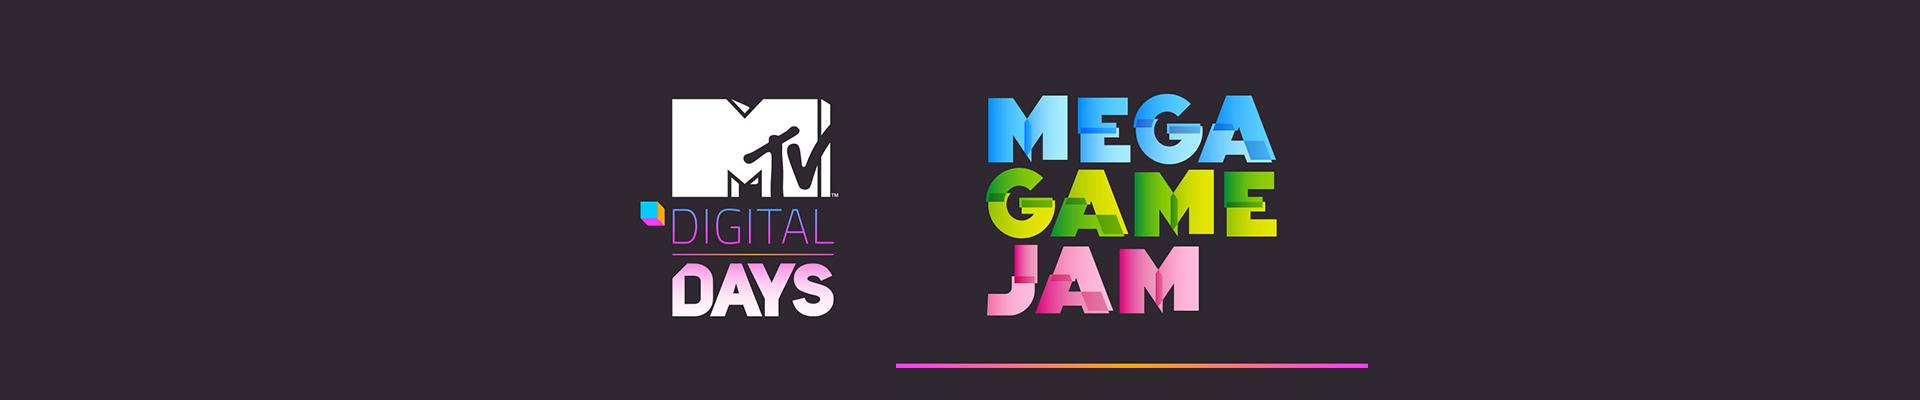 mtv_mega_game_jam